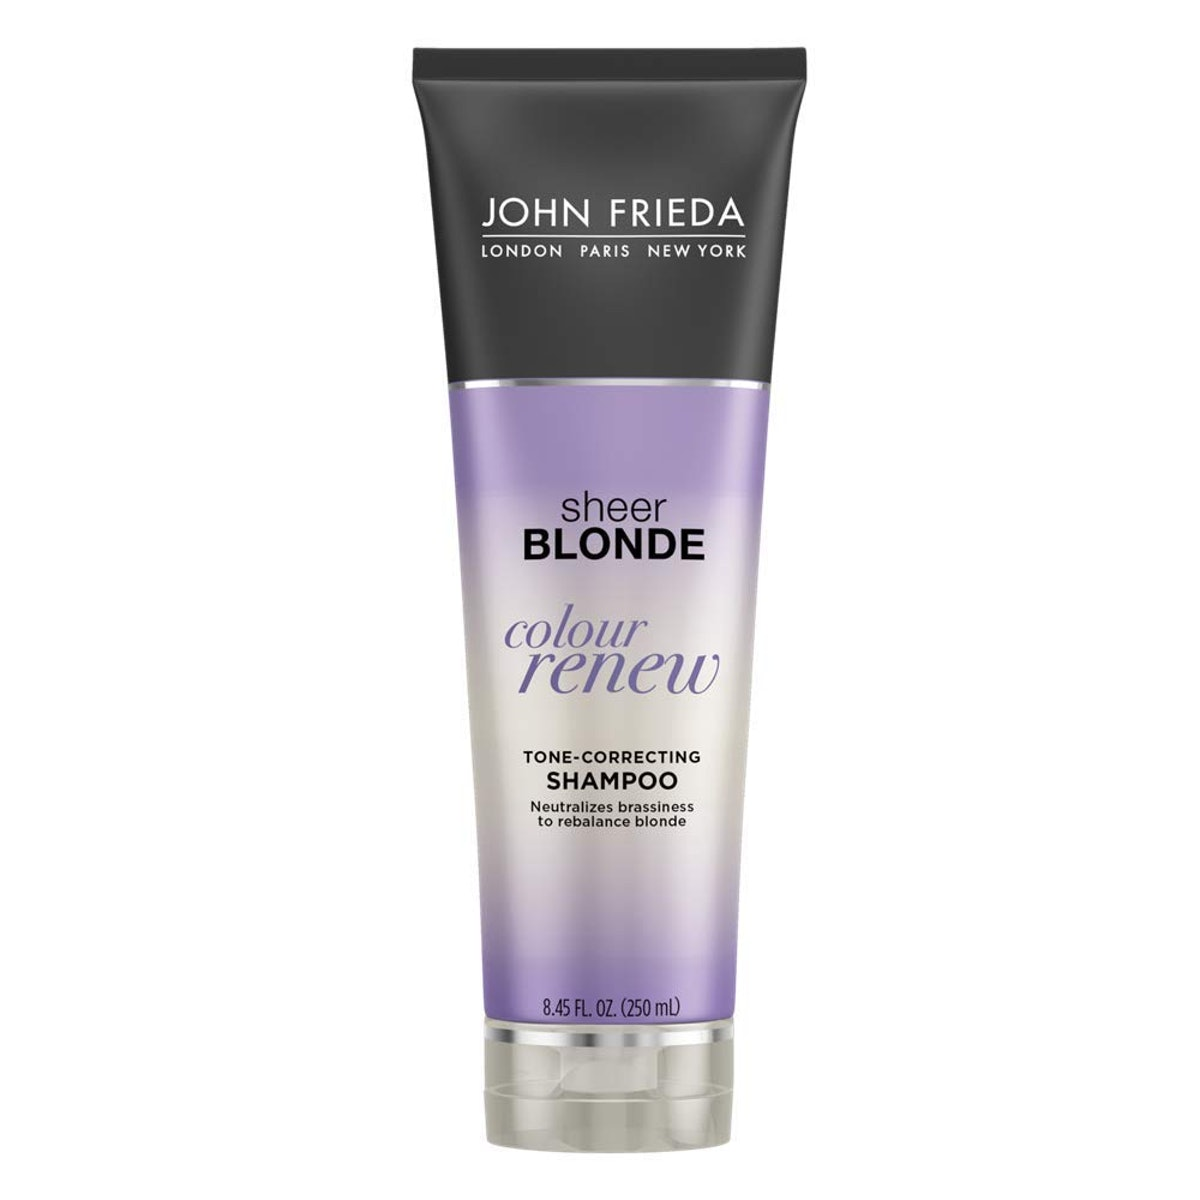 John Frieda Sheer Blonde Colour Renew Purple Shampoo, 8.45 oz  (Pack of 2)